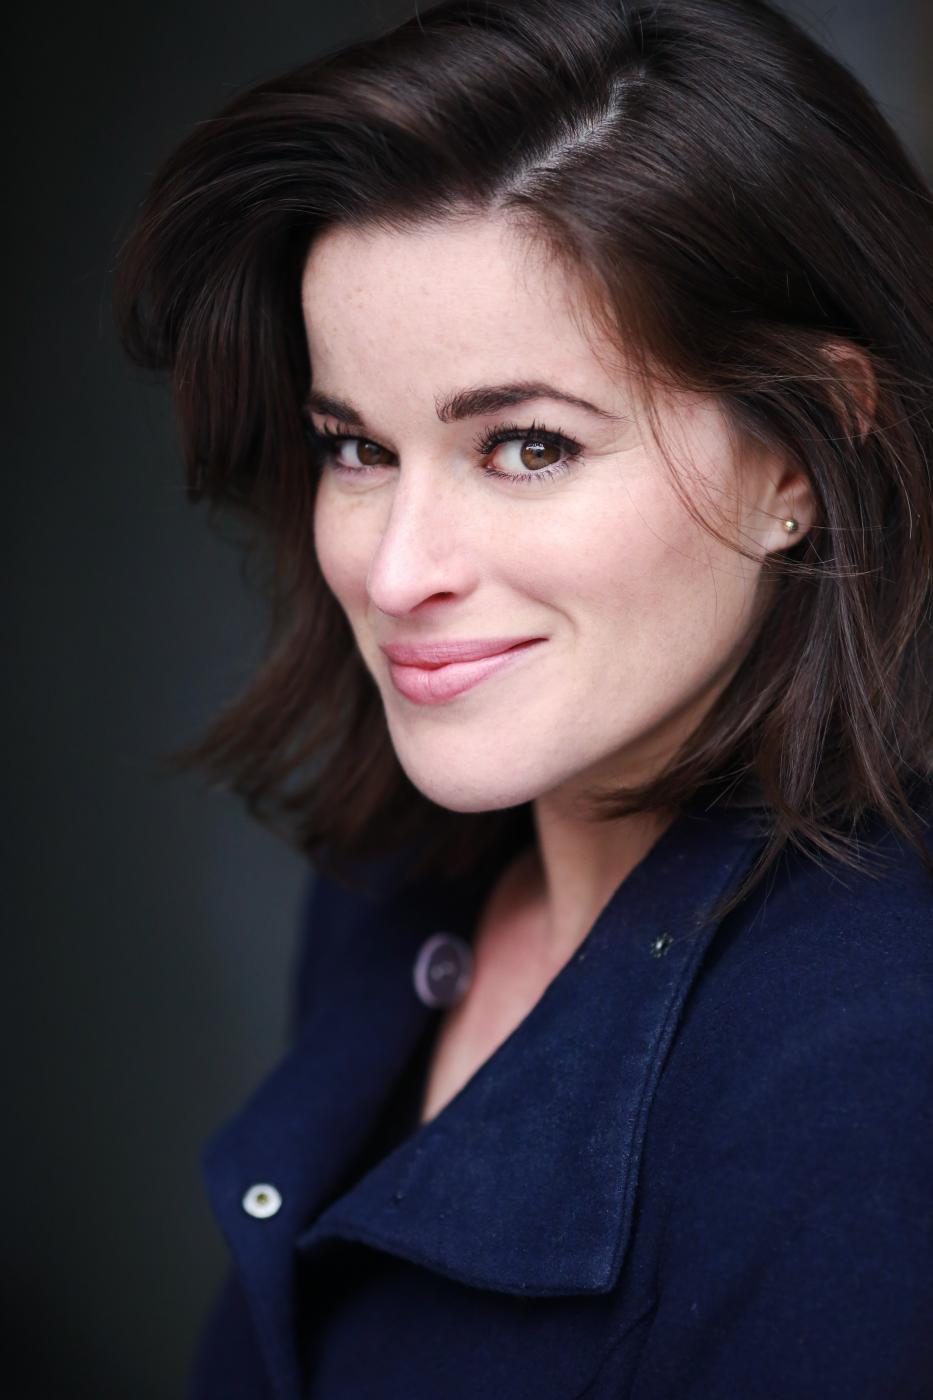 Natasha O'Brien